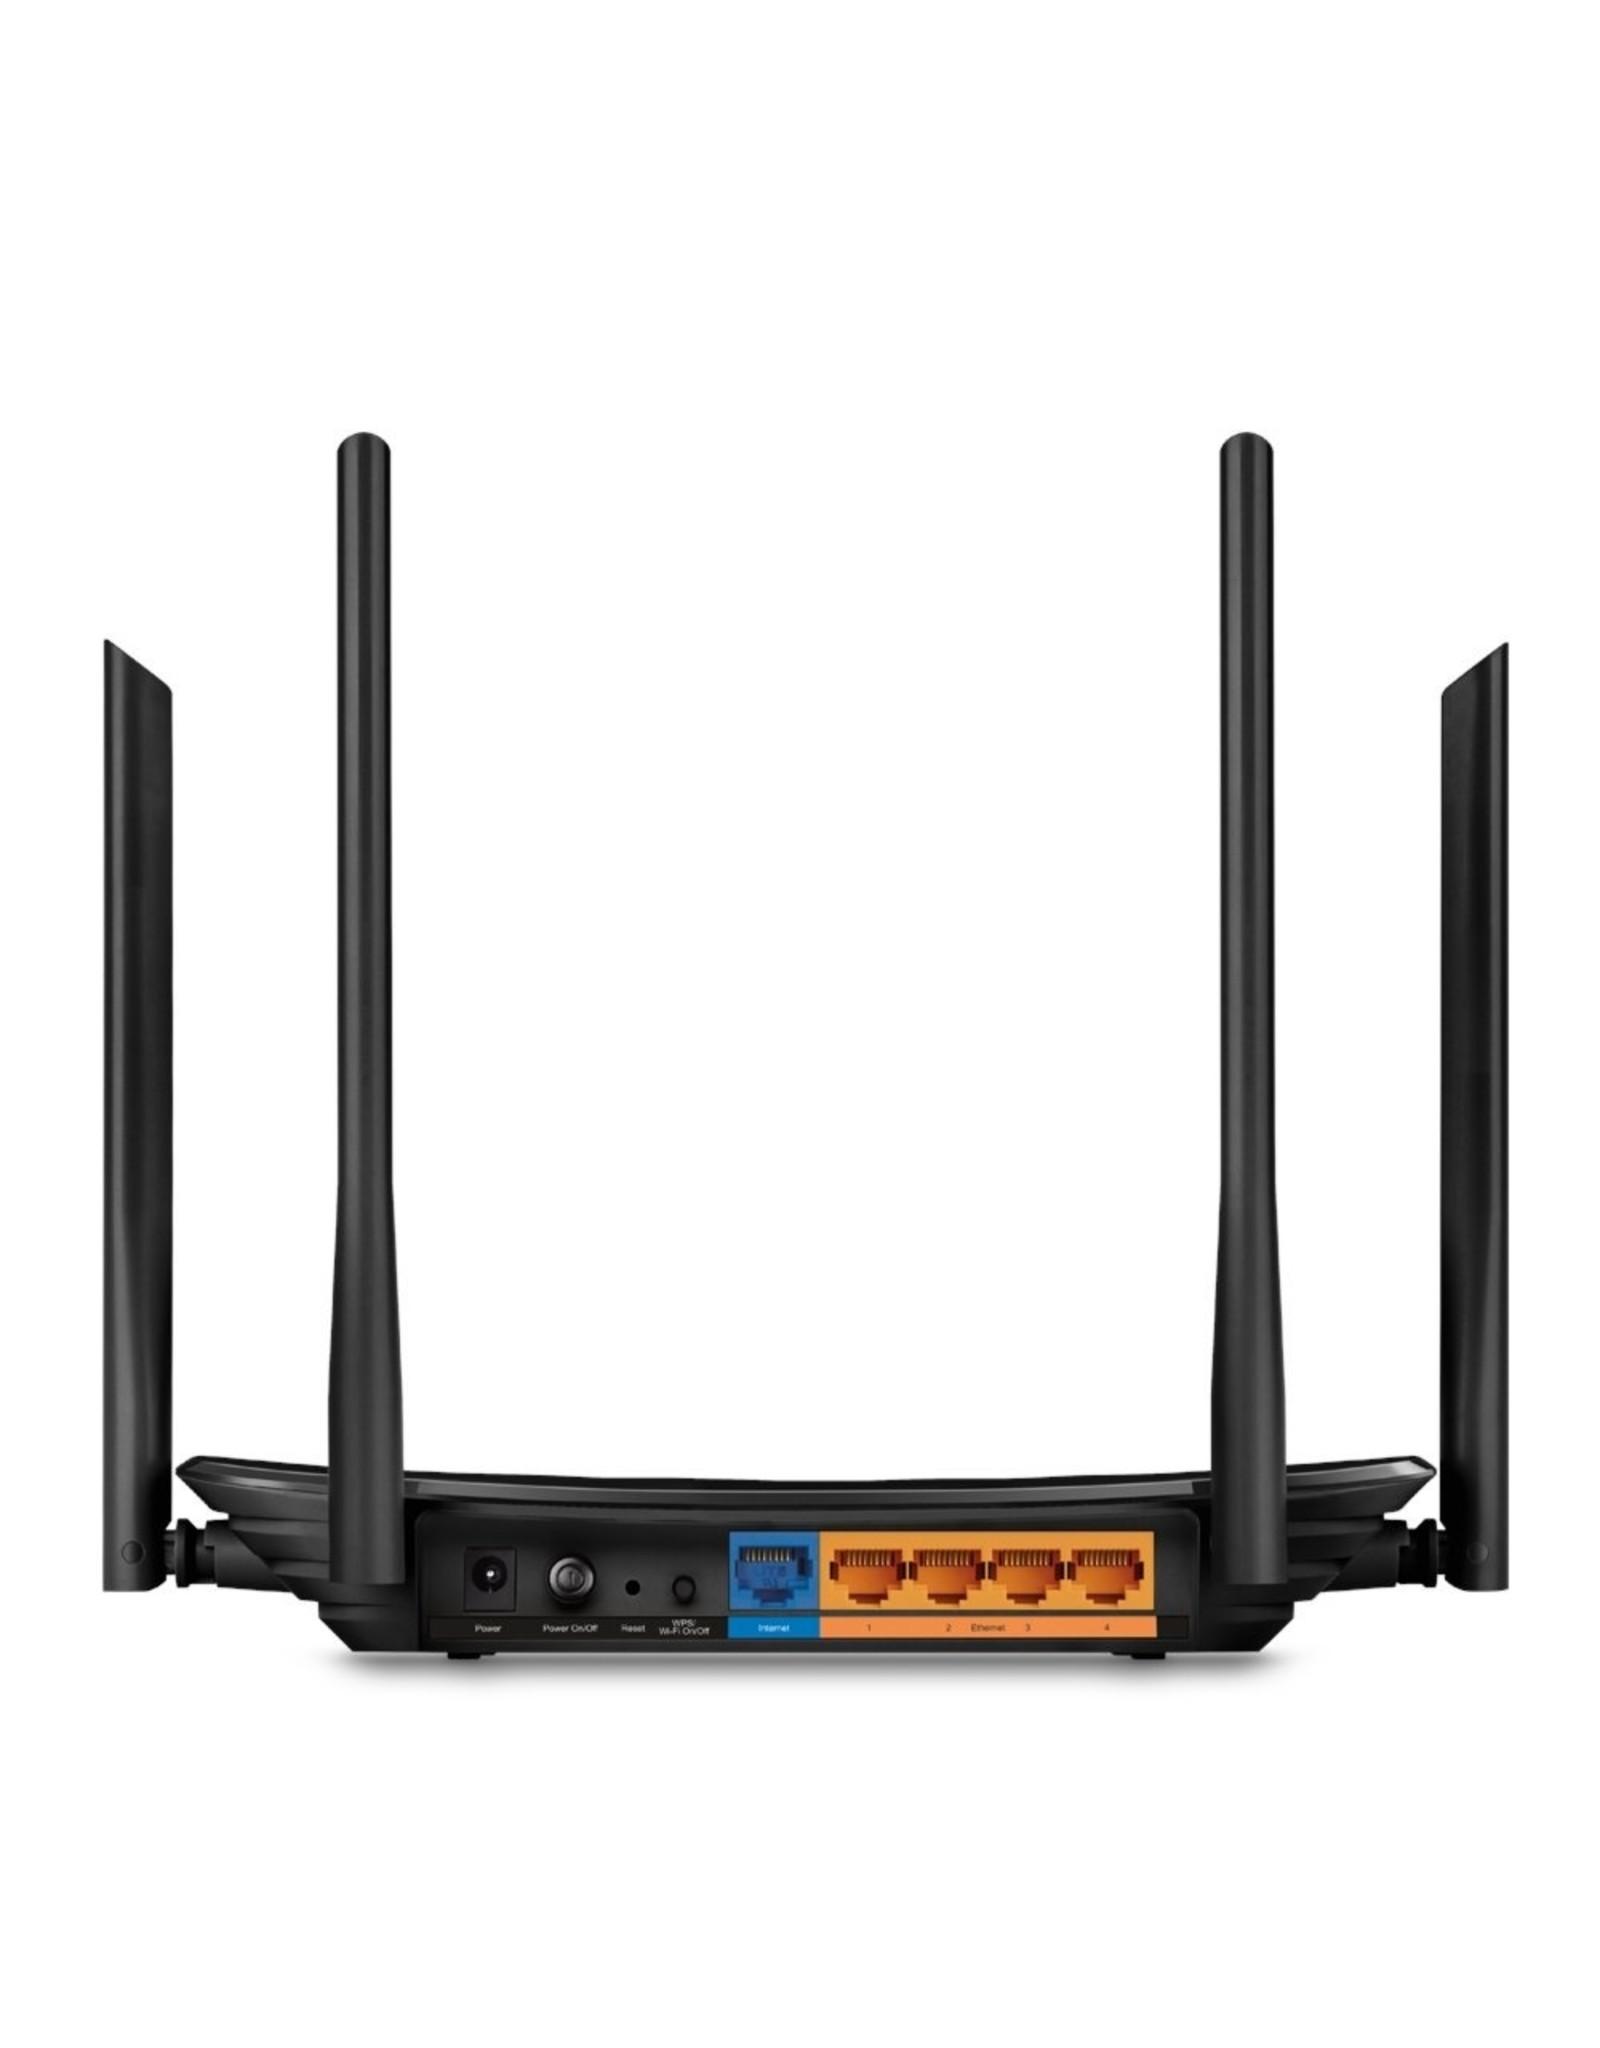 TP-Link Archer C6 AC1200 Wireless DualBand Gigabit Router